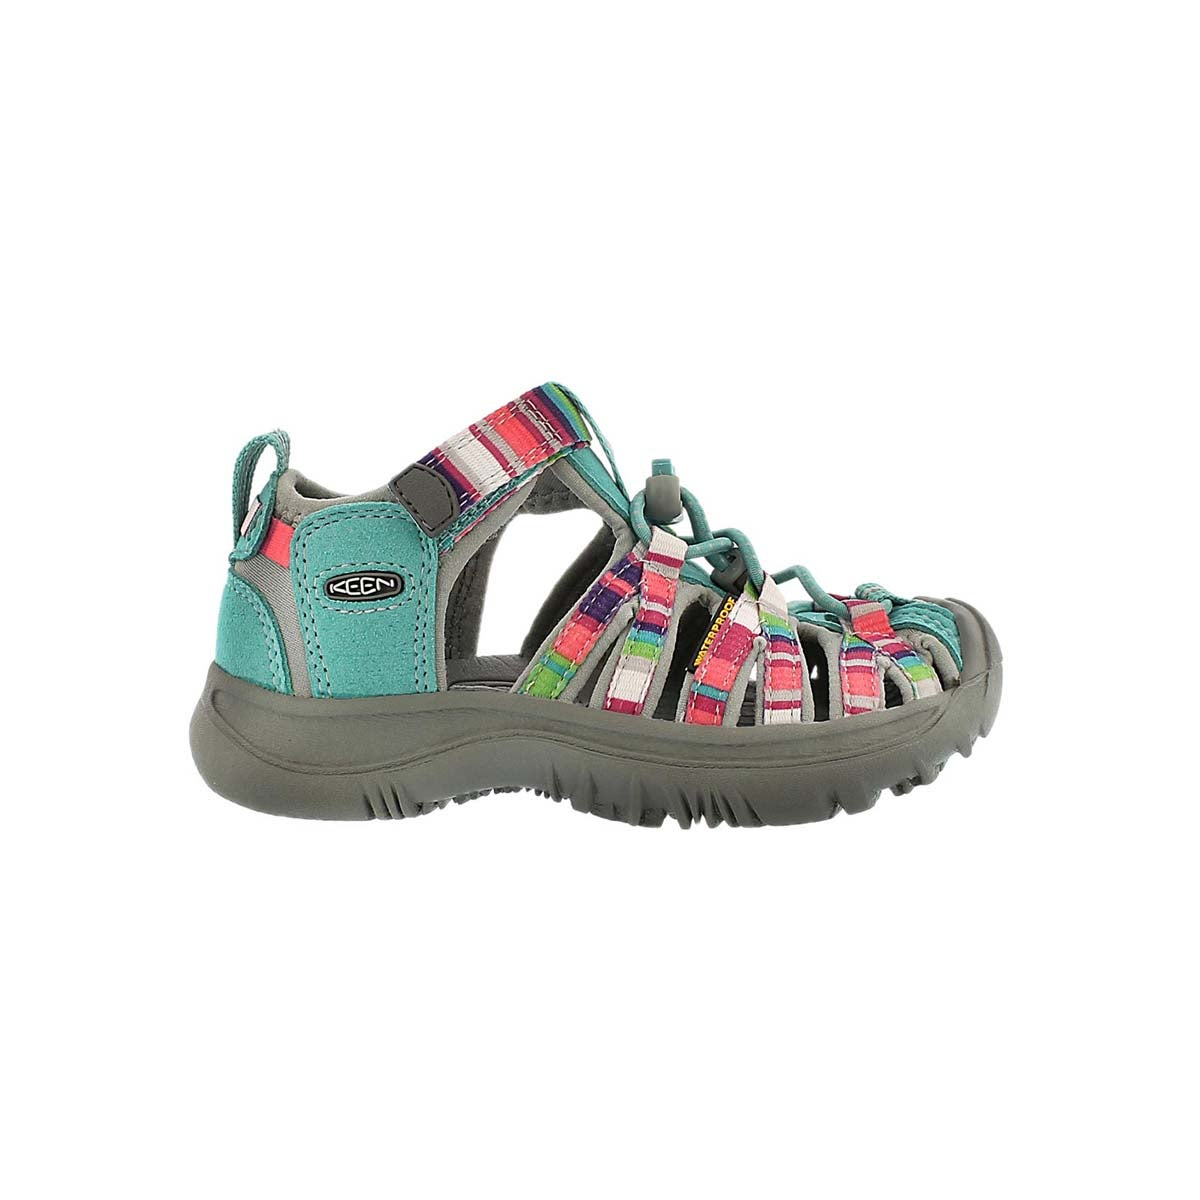 Sandale sport WHISPER, bleu/multi, bébés